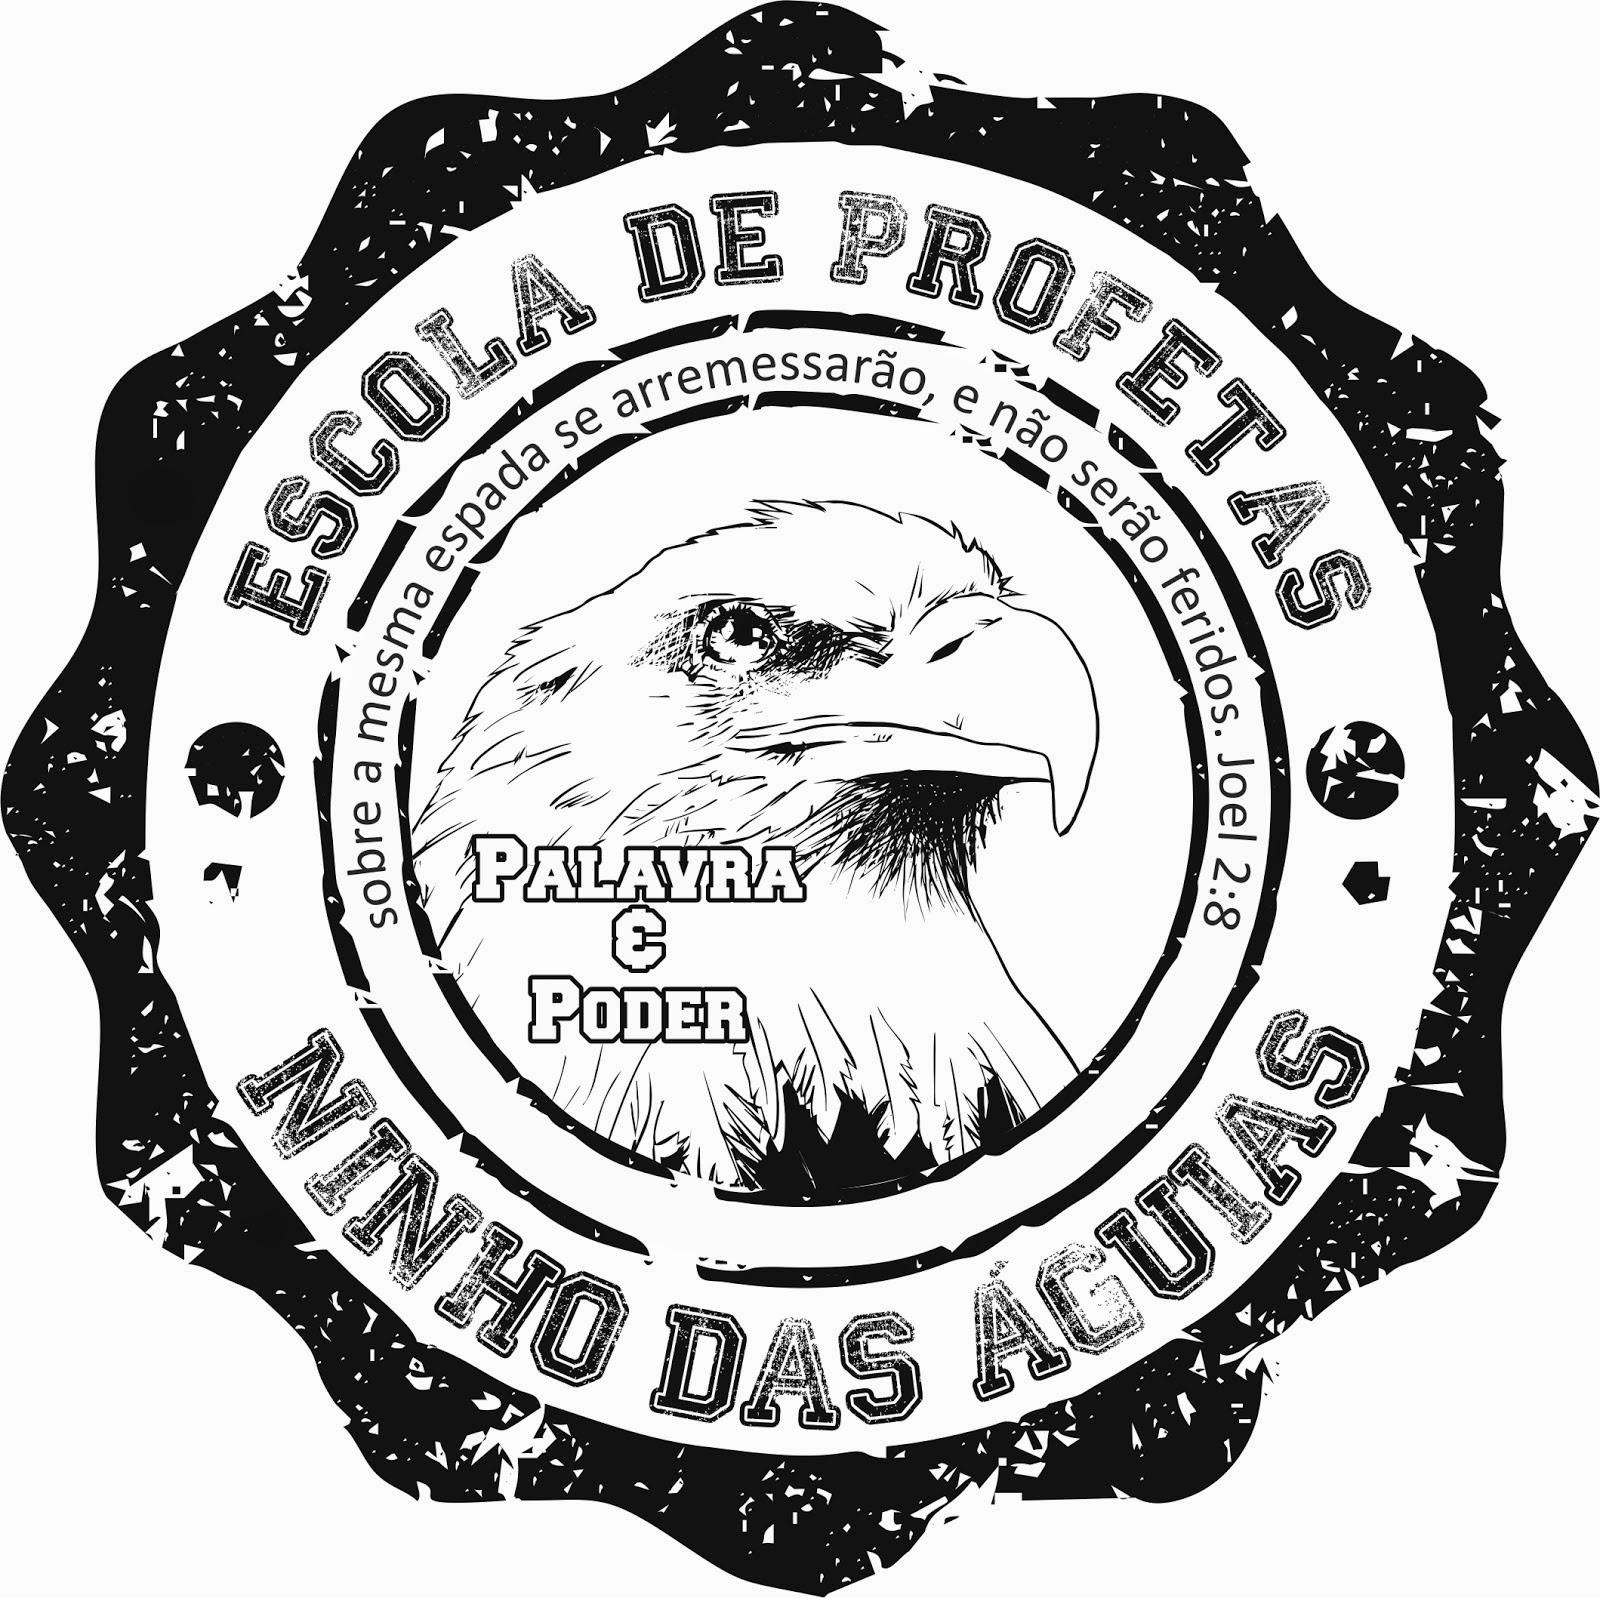 Escola de Profetas 2015: matricule-se!